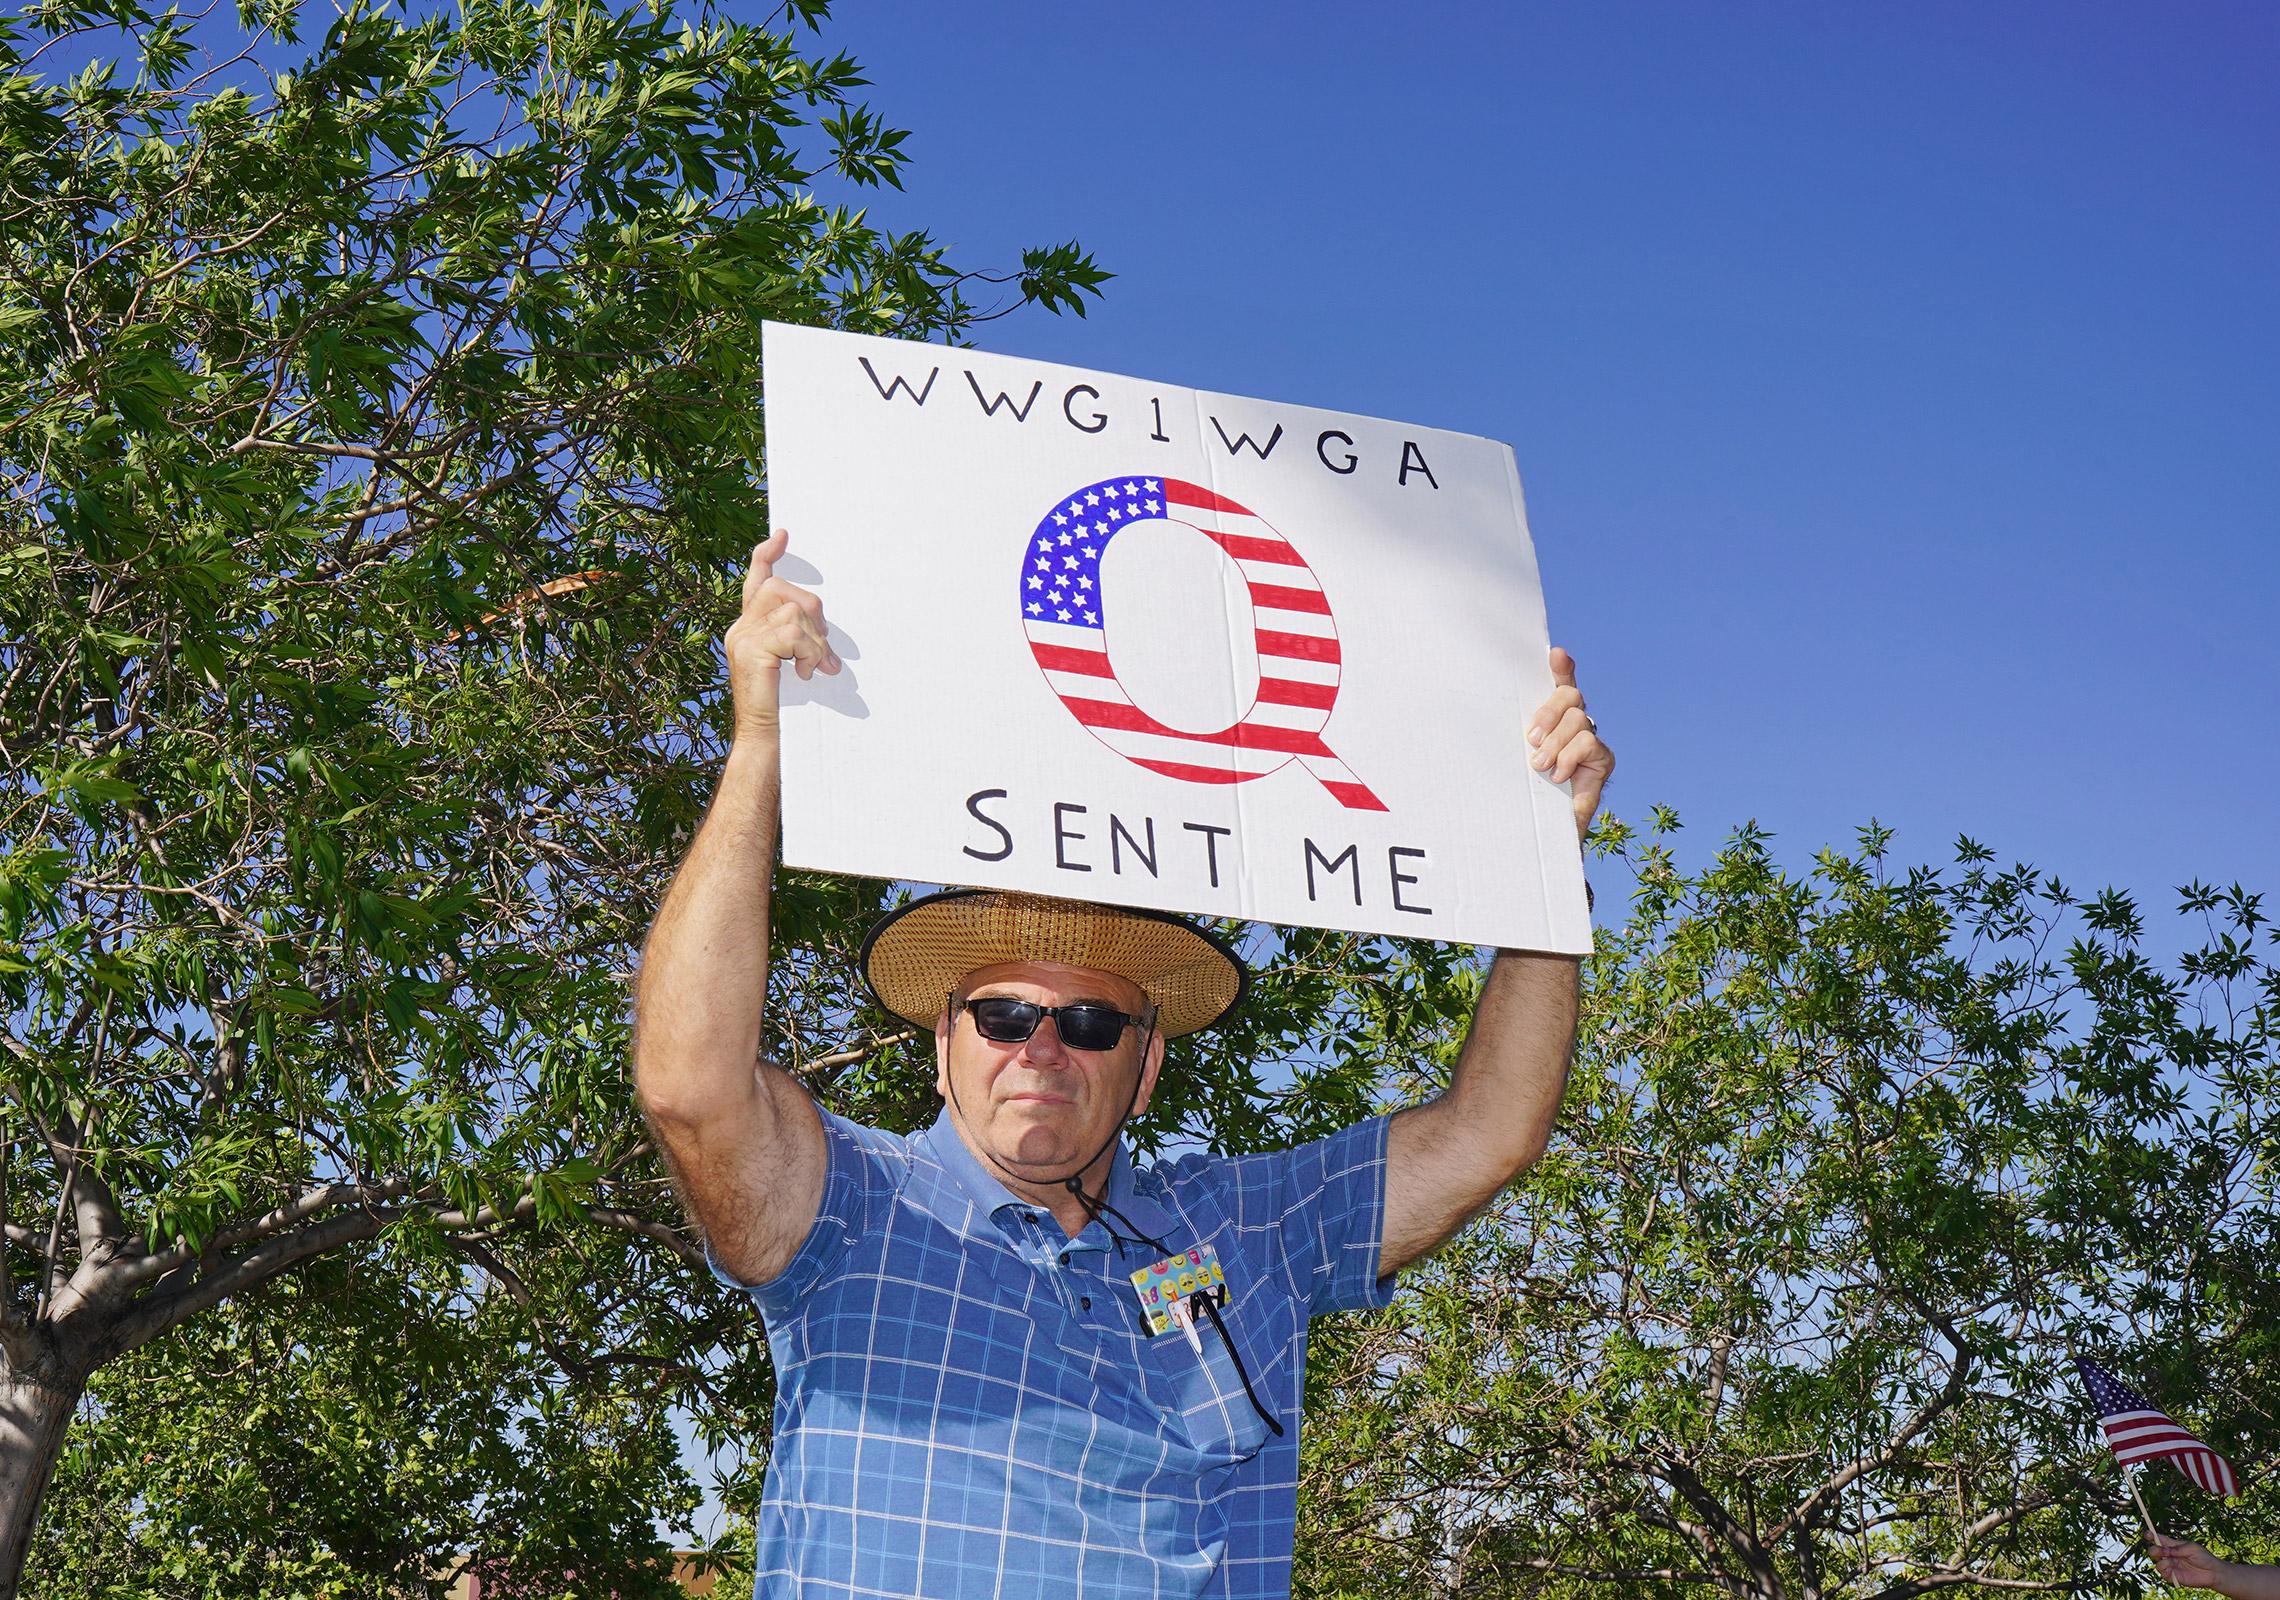 A protester with a QAnon sign at an anti-lockdown rally in Santa Clarita, Calif., May 21, 2020.